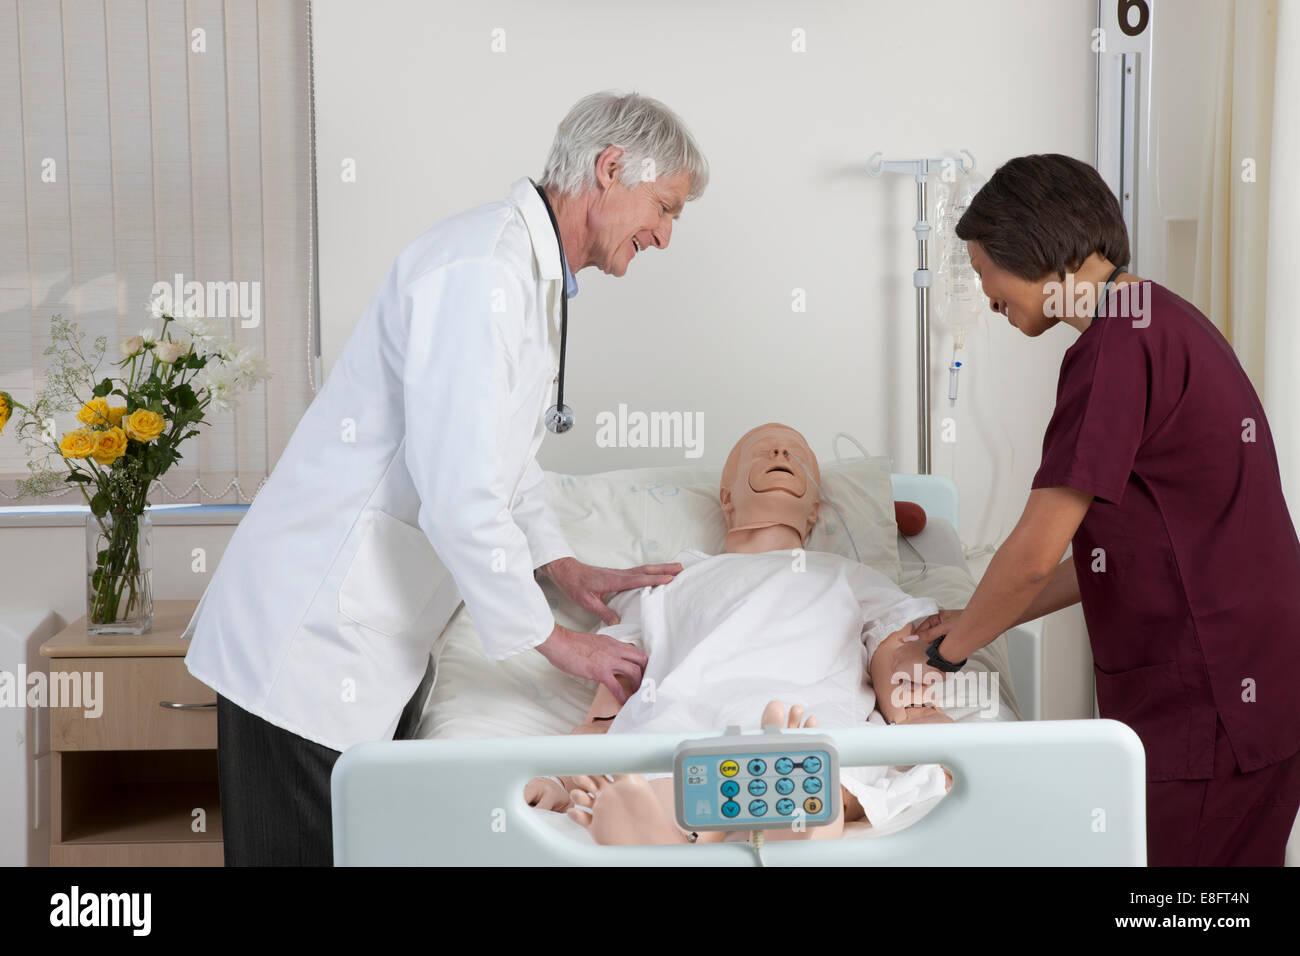 dc6b7468965 Nurse Training Dummy Stock Photos & Nurse Training Dummy Stock ...